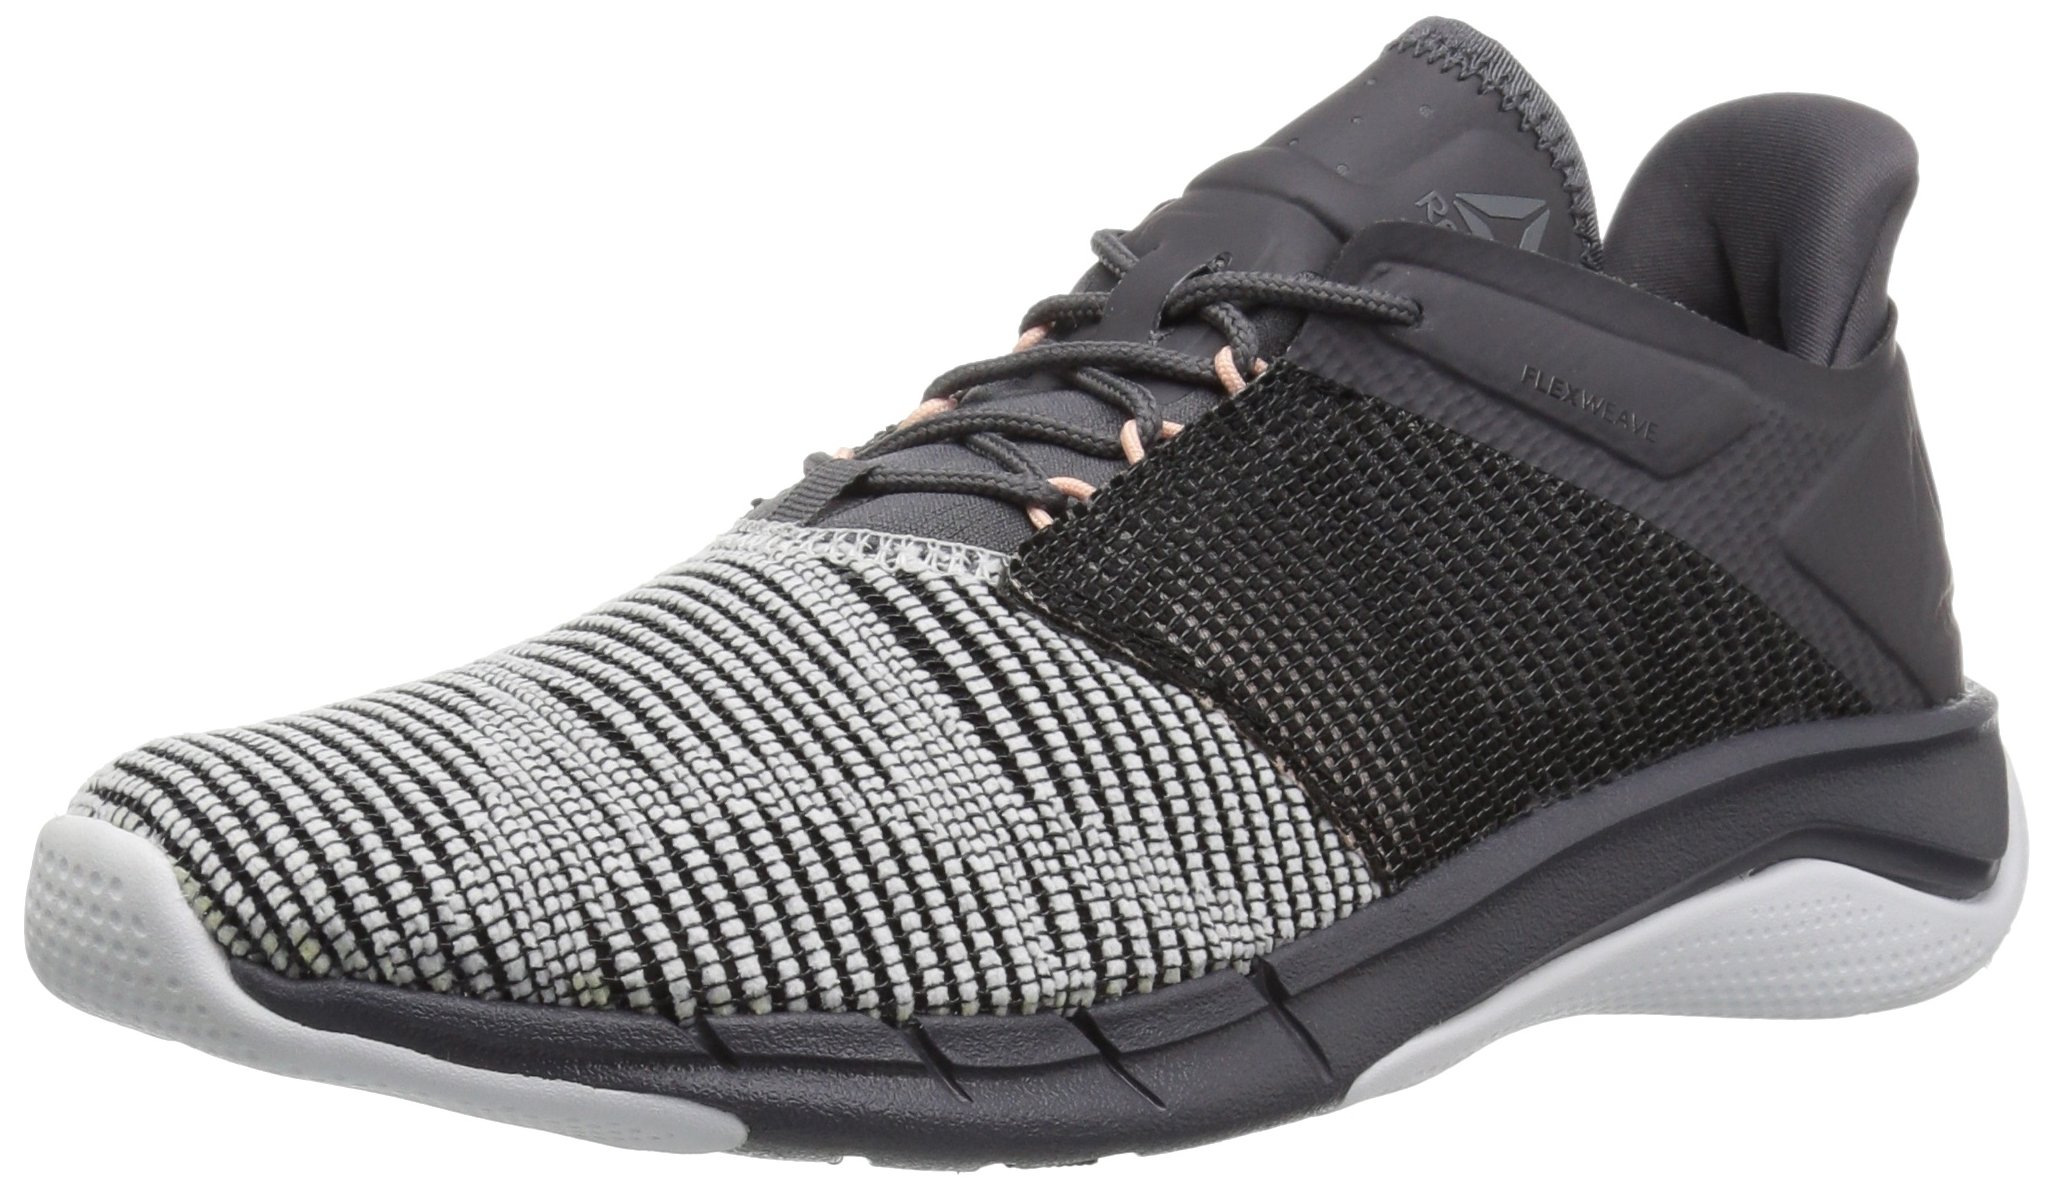 Reebok Women's Fast Flexweave Running Shoe, White/Ash Grey/Black/Desert Dust, 8 M US